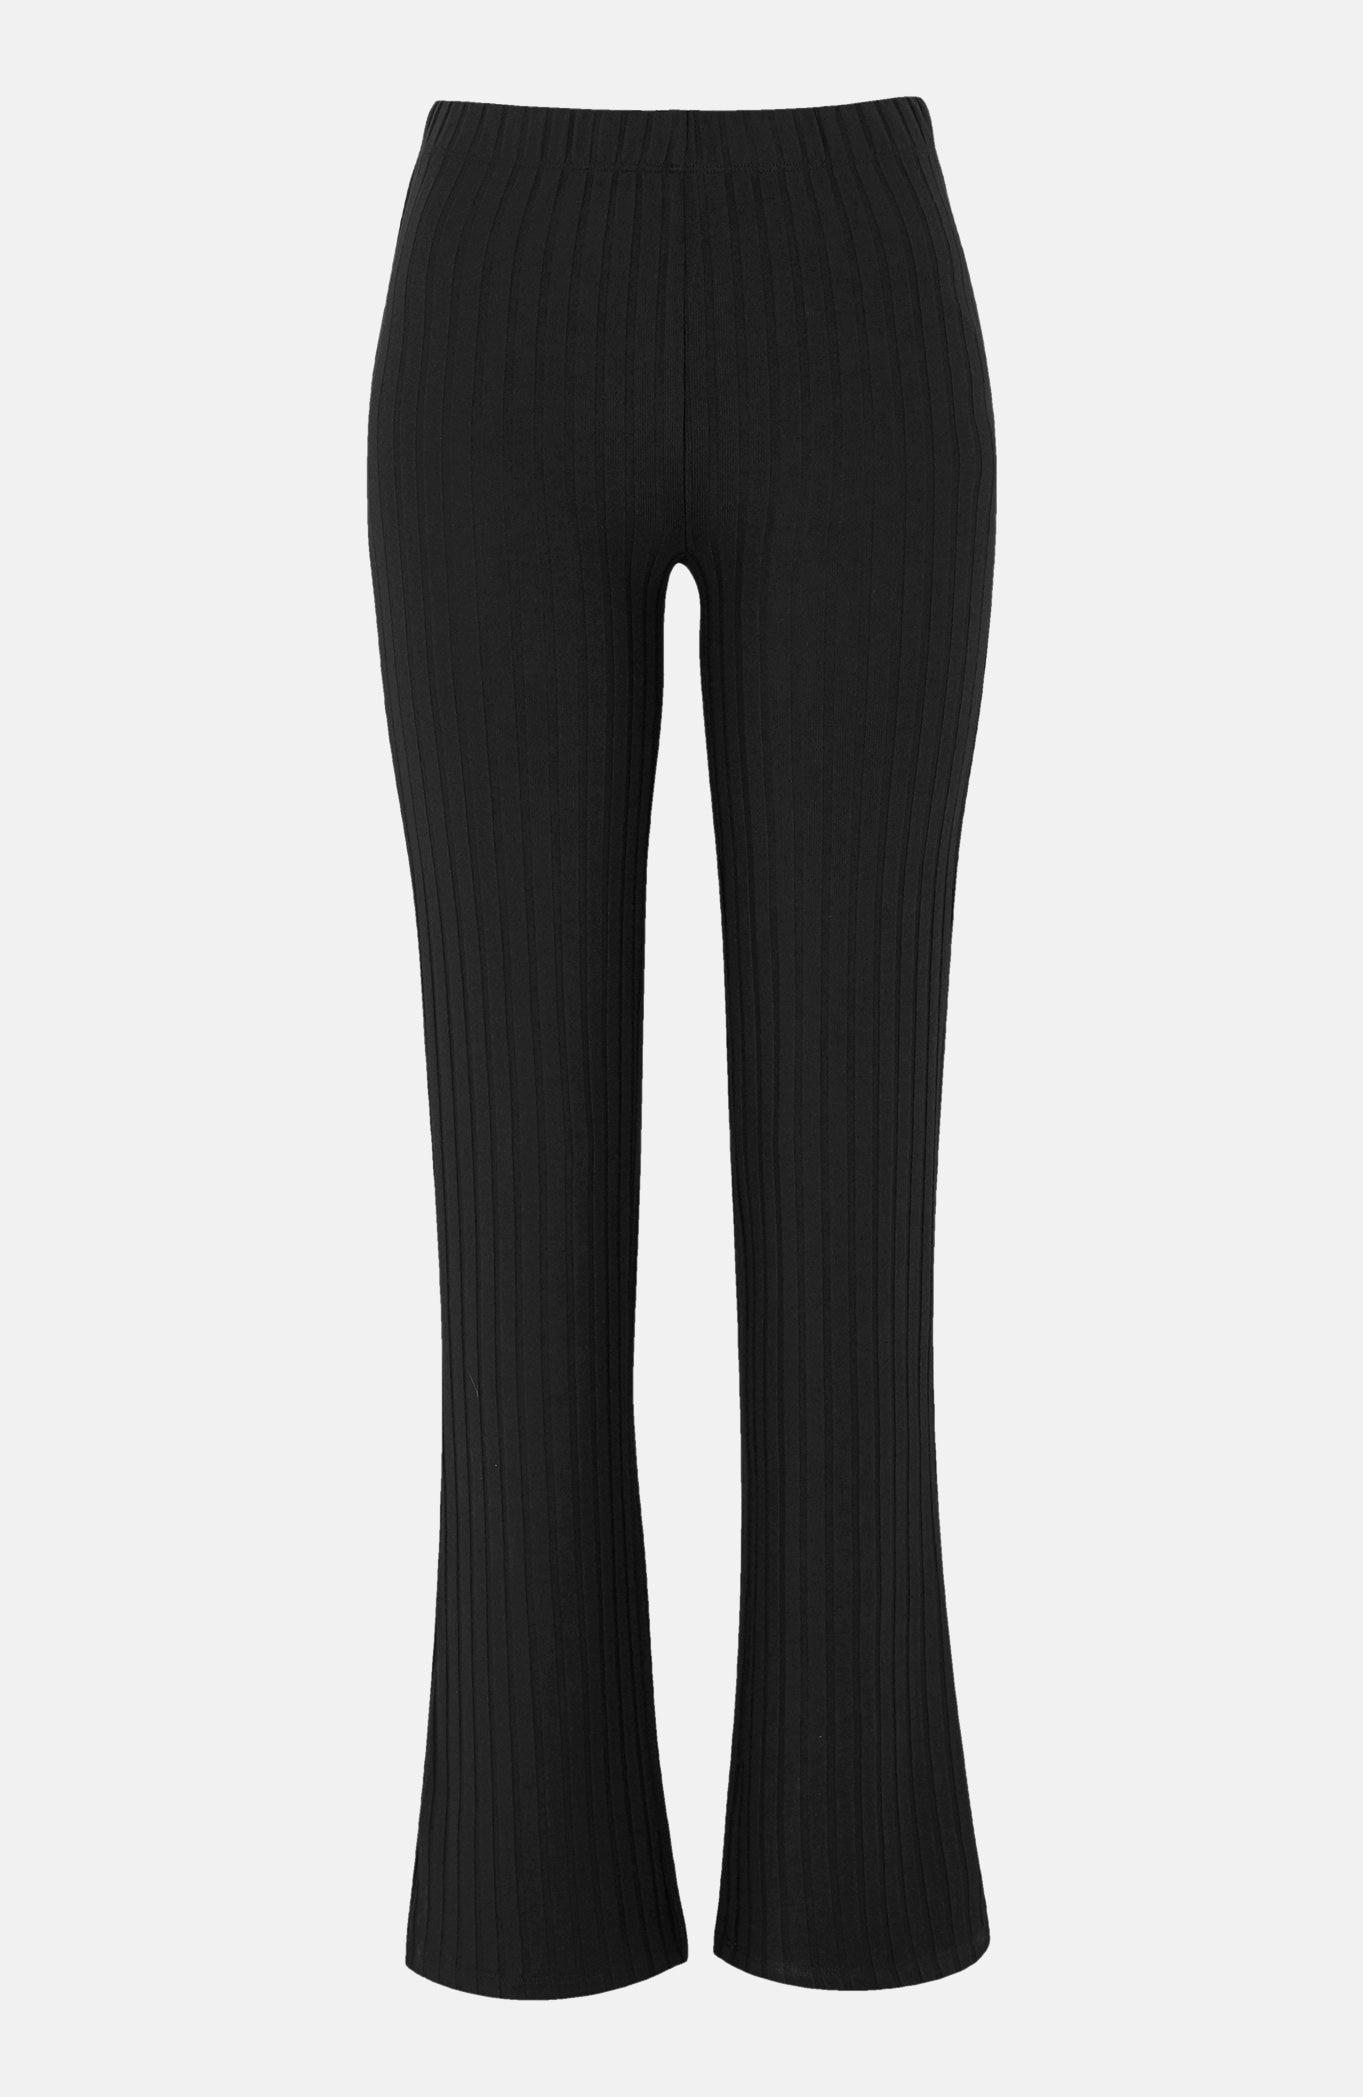 Prążkowane legginsy okroju bootcut